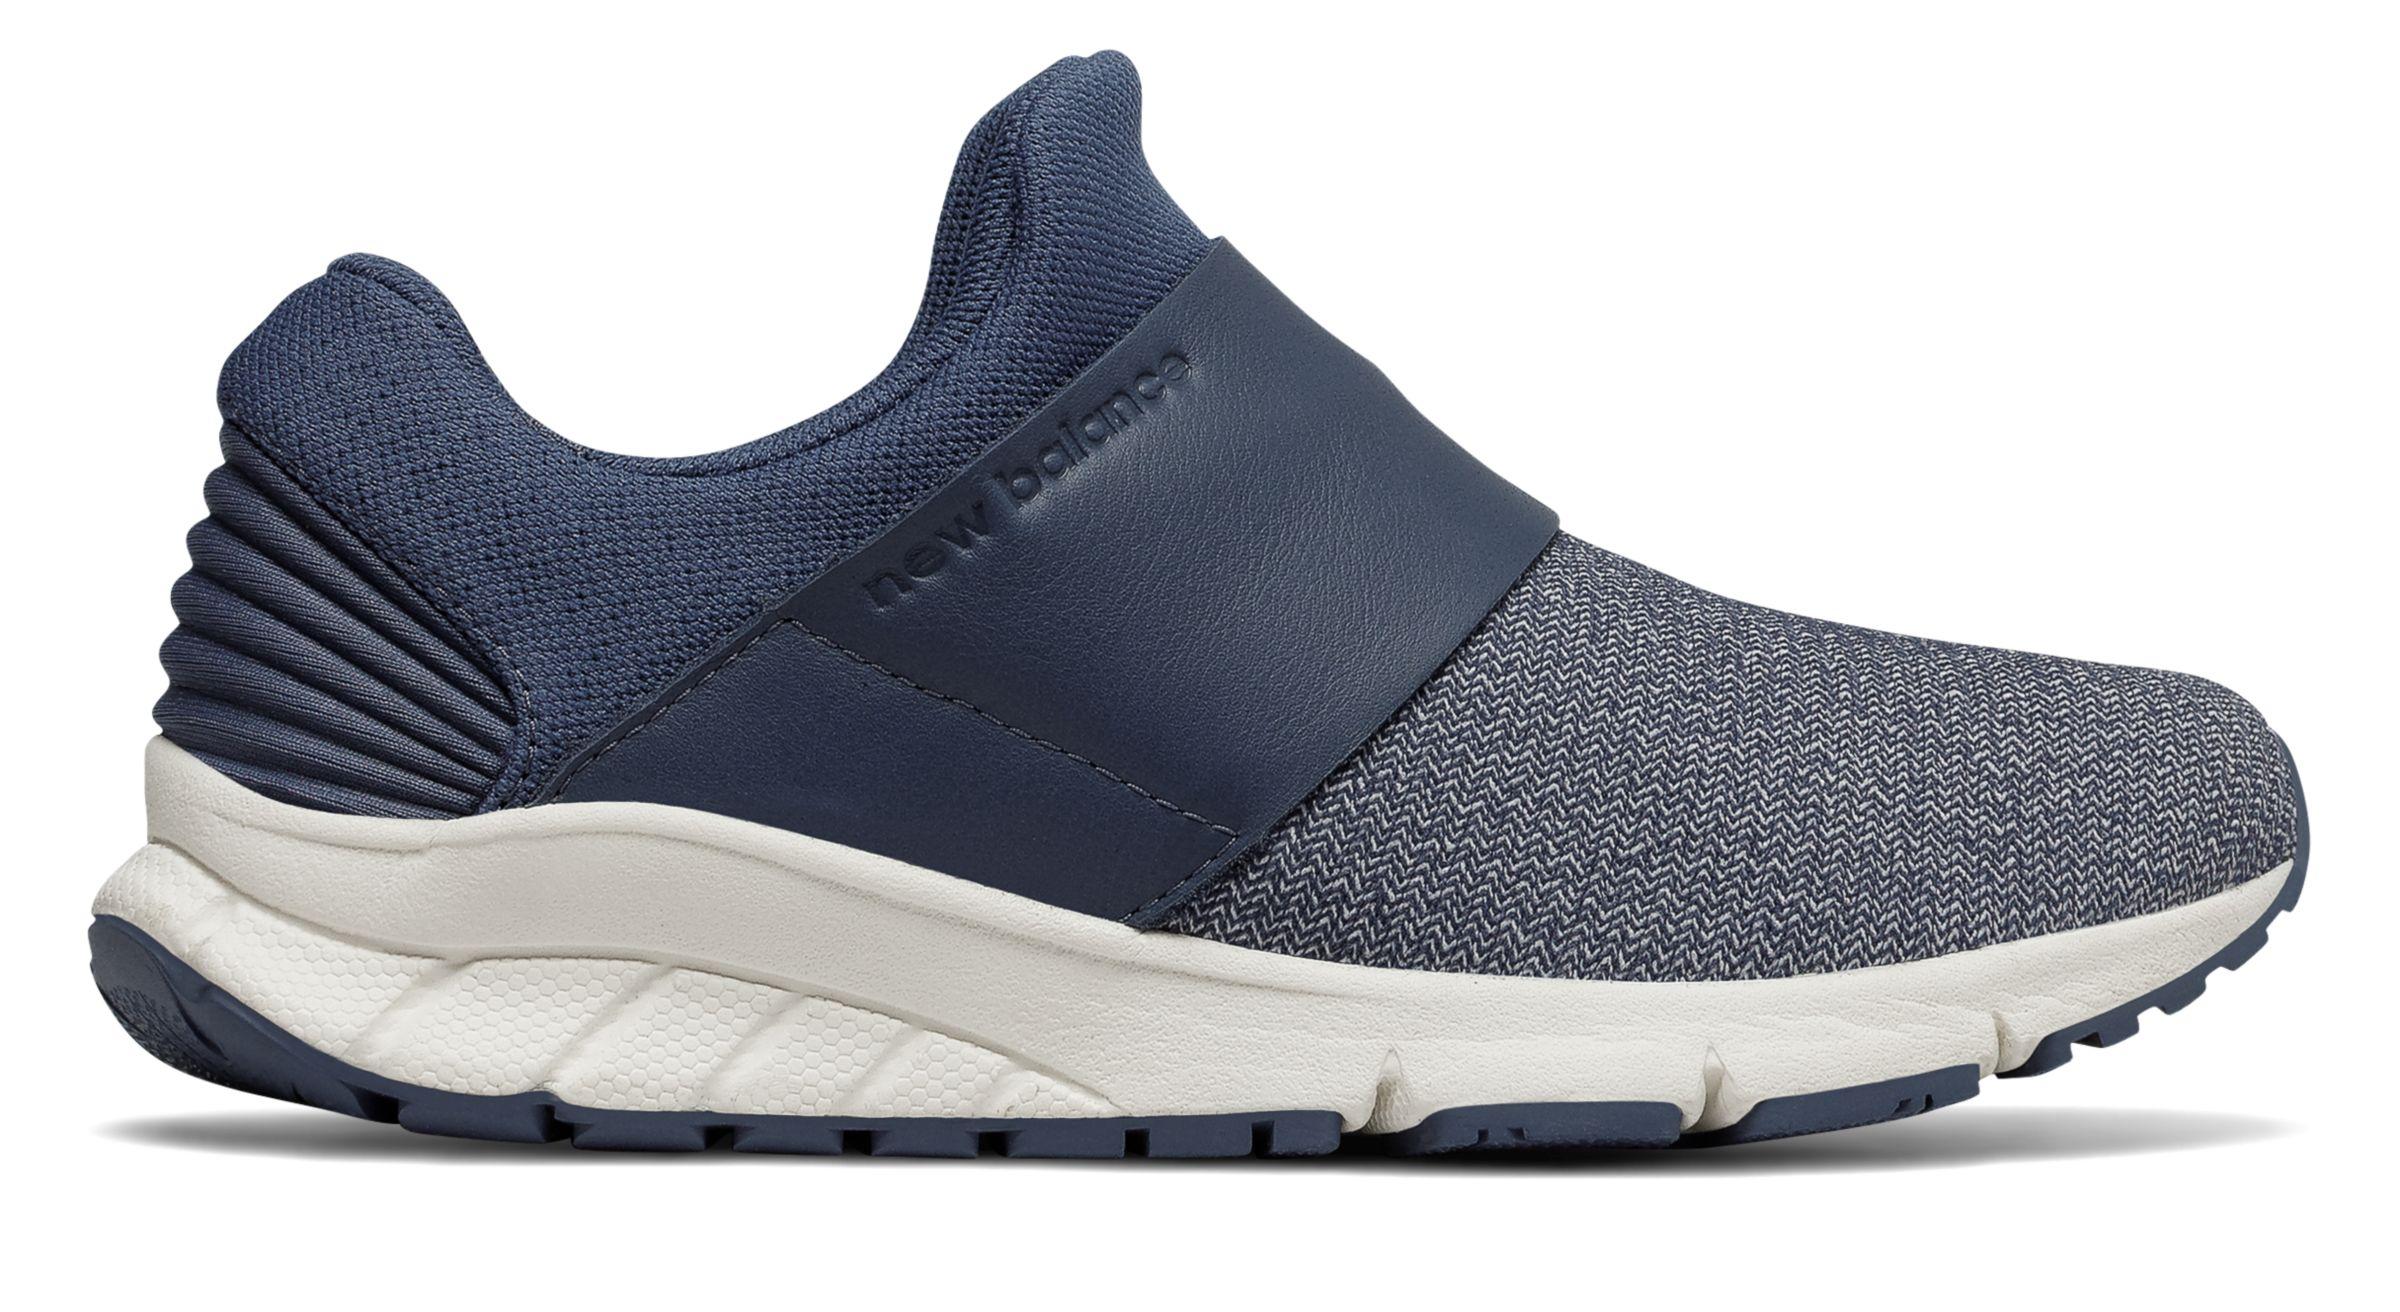 joes shoes new balance womens black slip ons